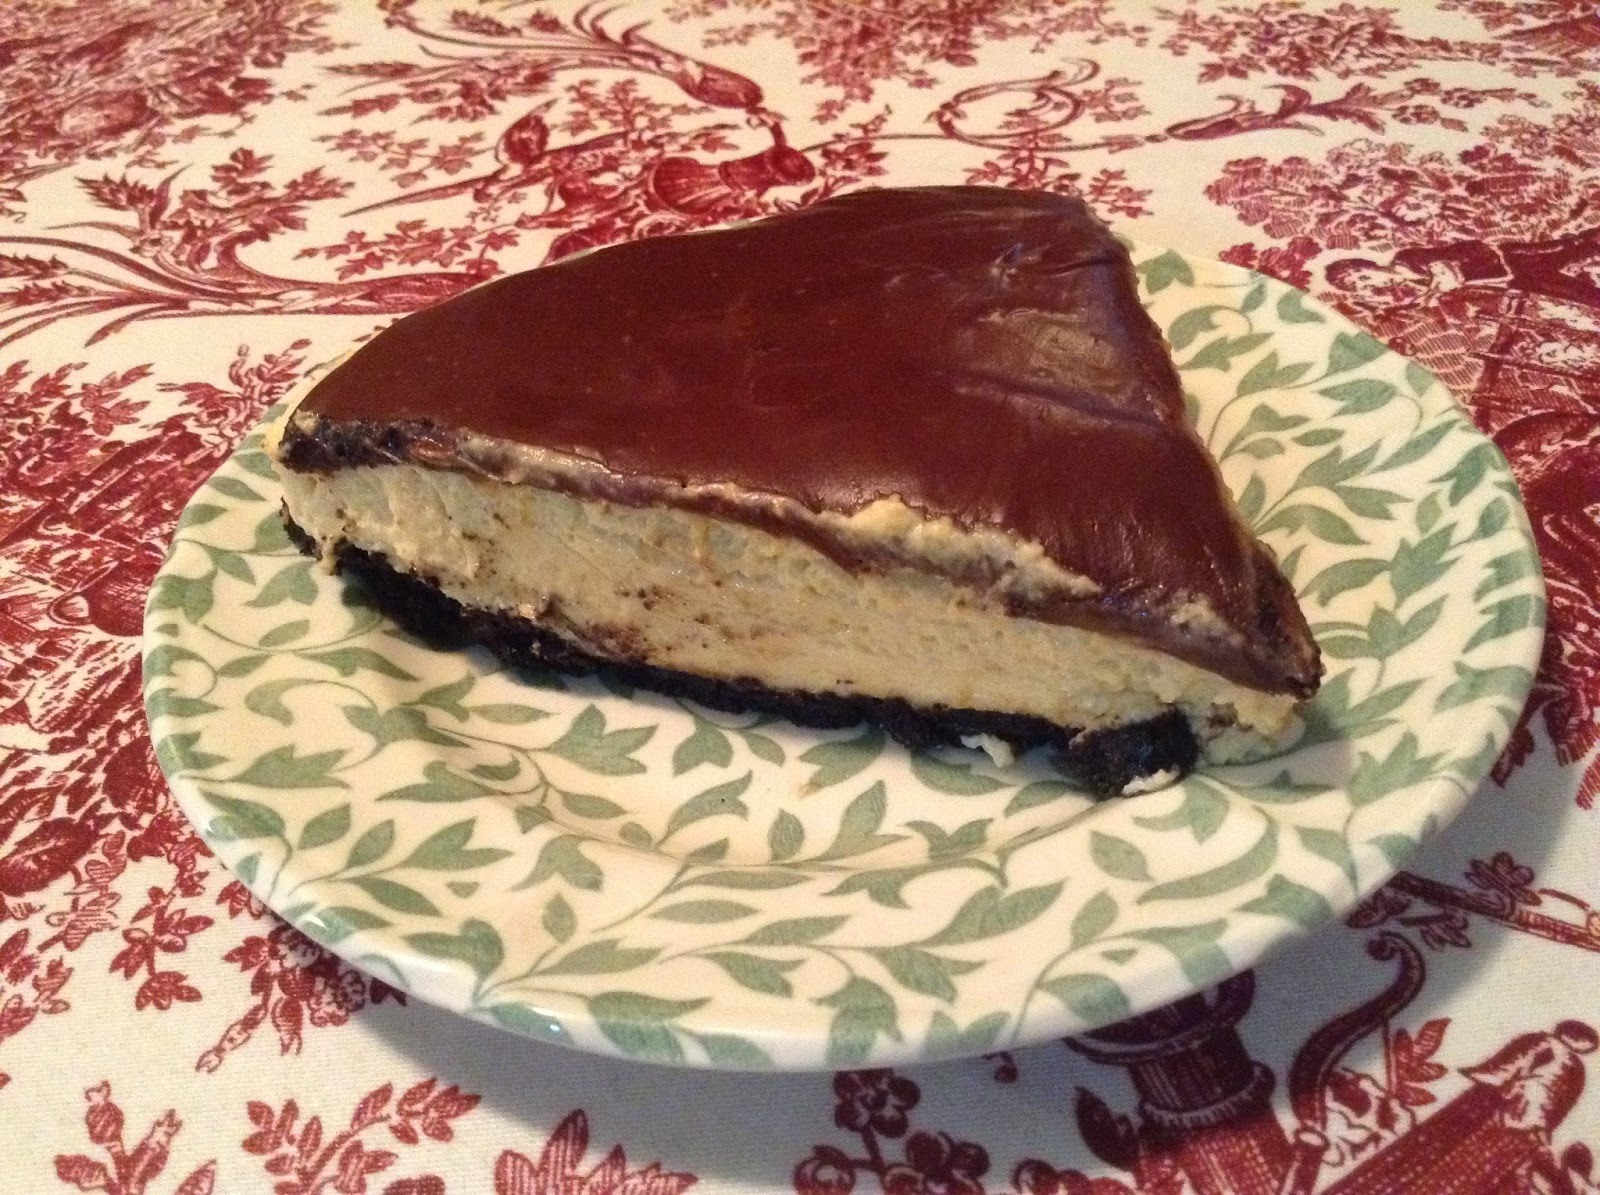 Tarta de queso y dulce de leche, cheesecake, receta